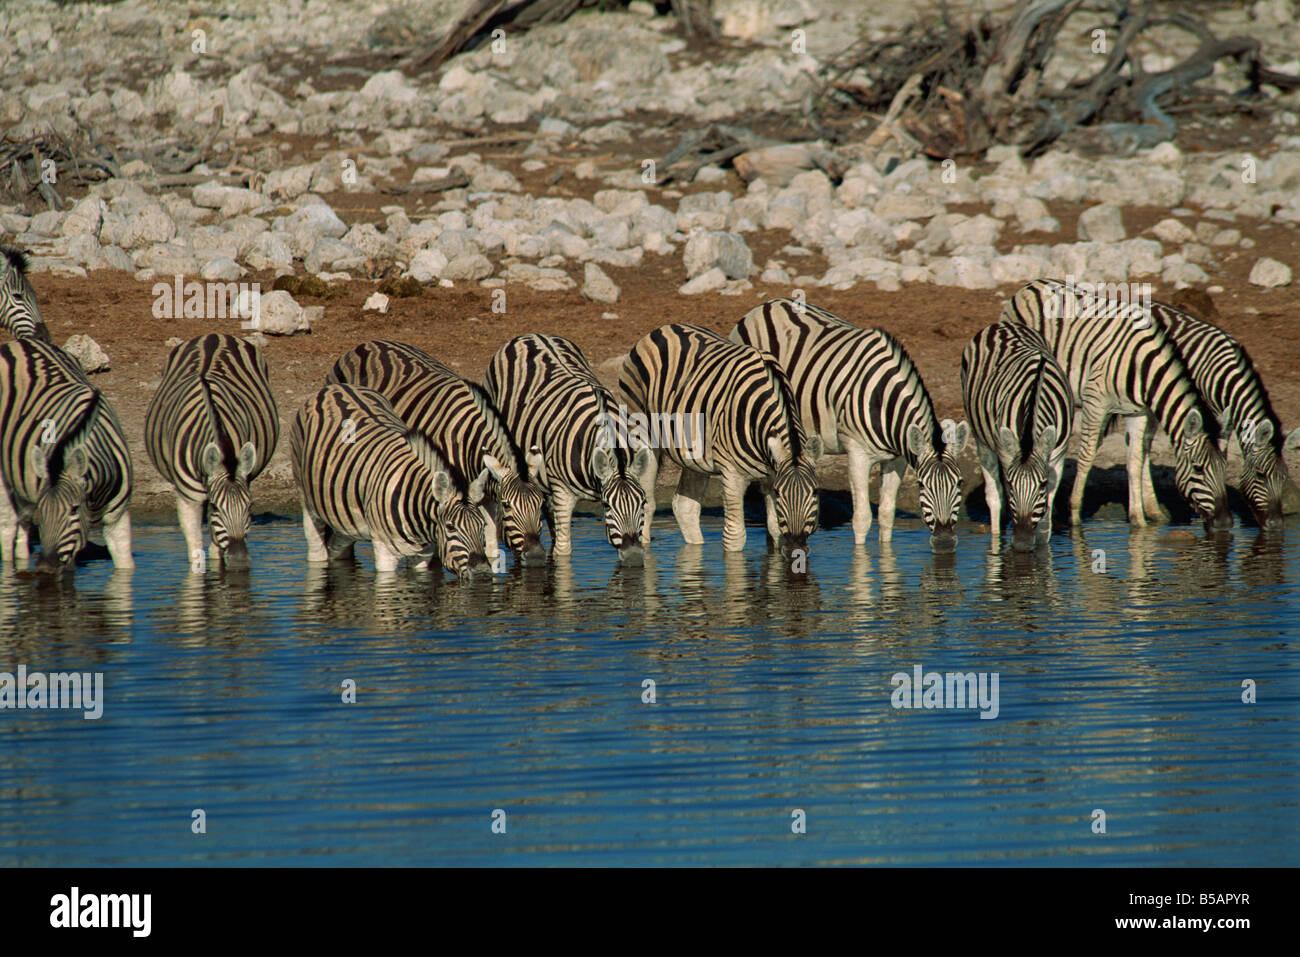 Zebra at a waterhole, Namibia, Africa - Stock Image